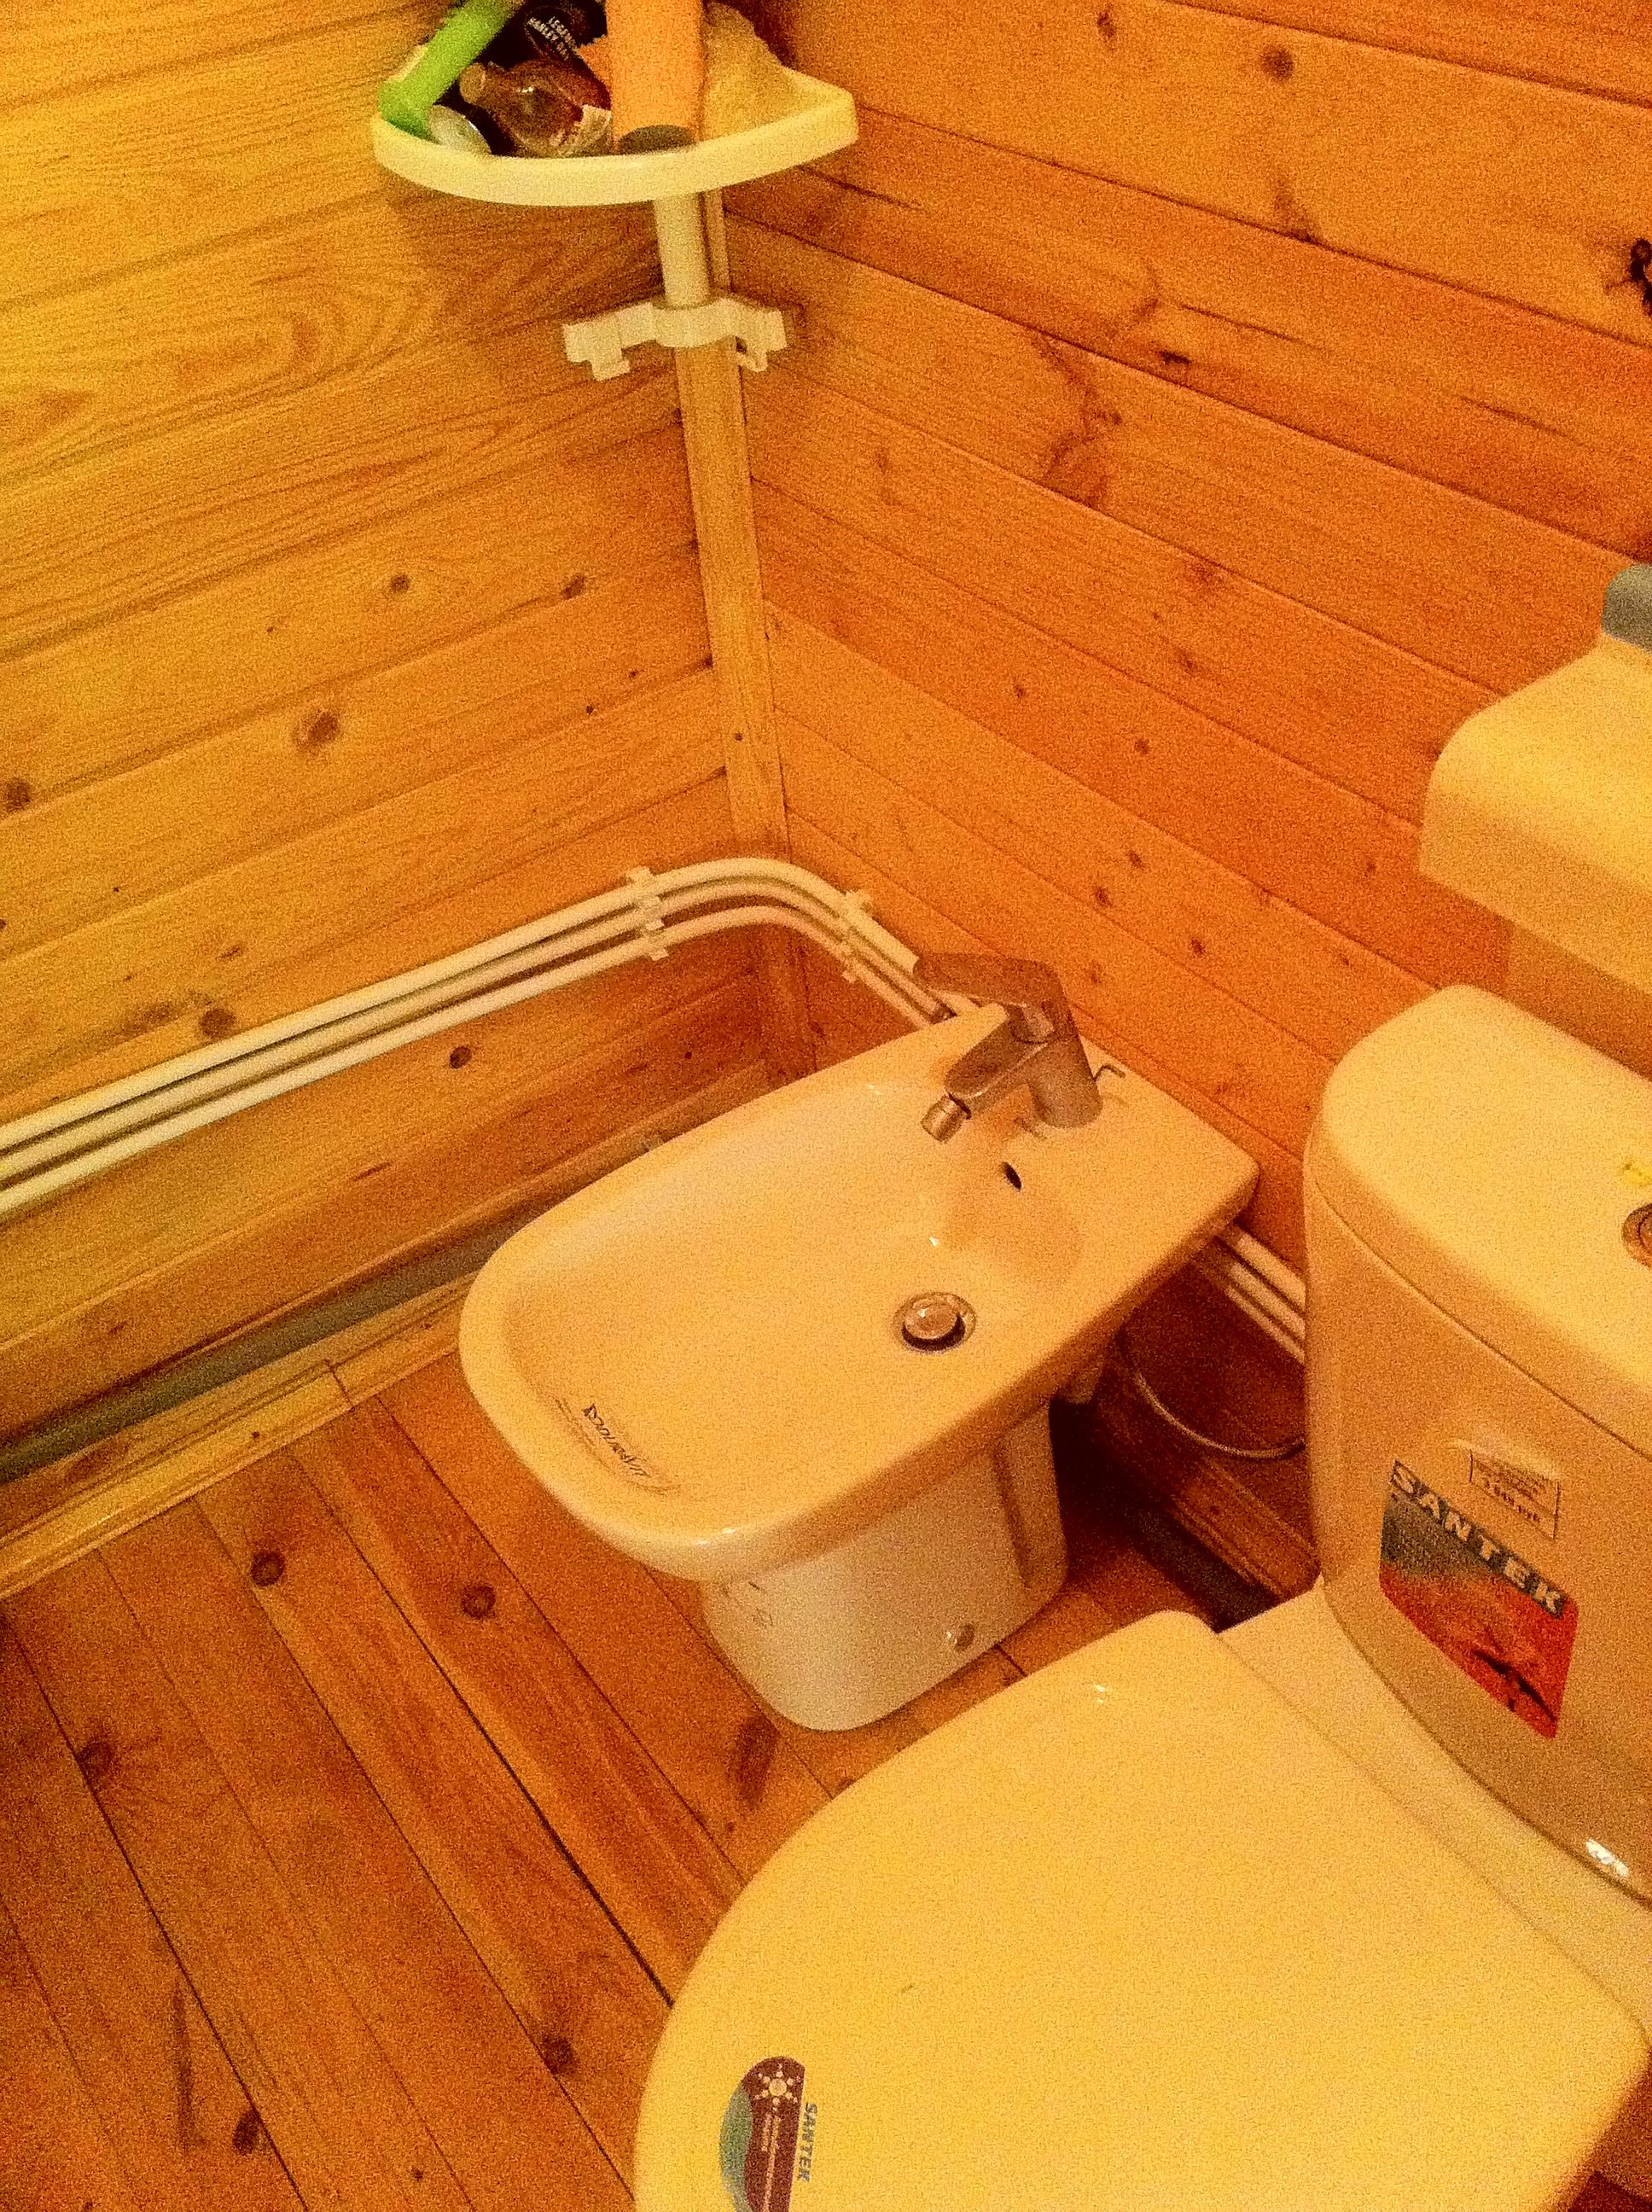 Монтаж туалета своими руками в деревянном доме